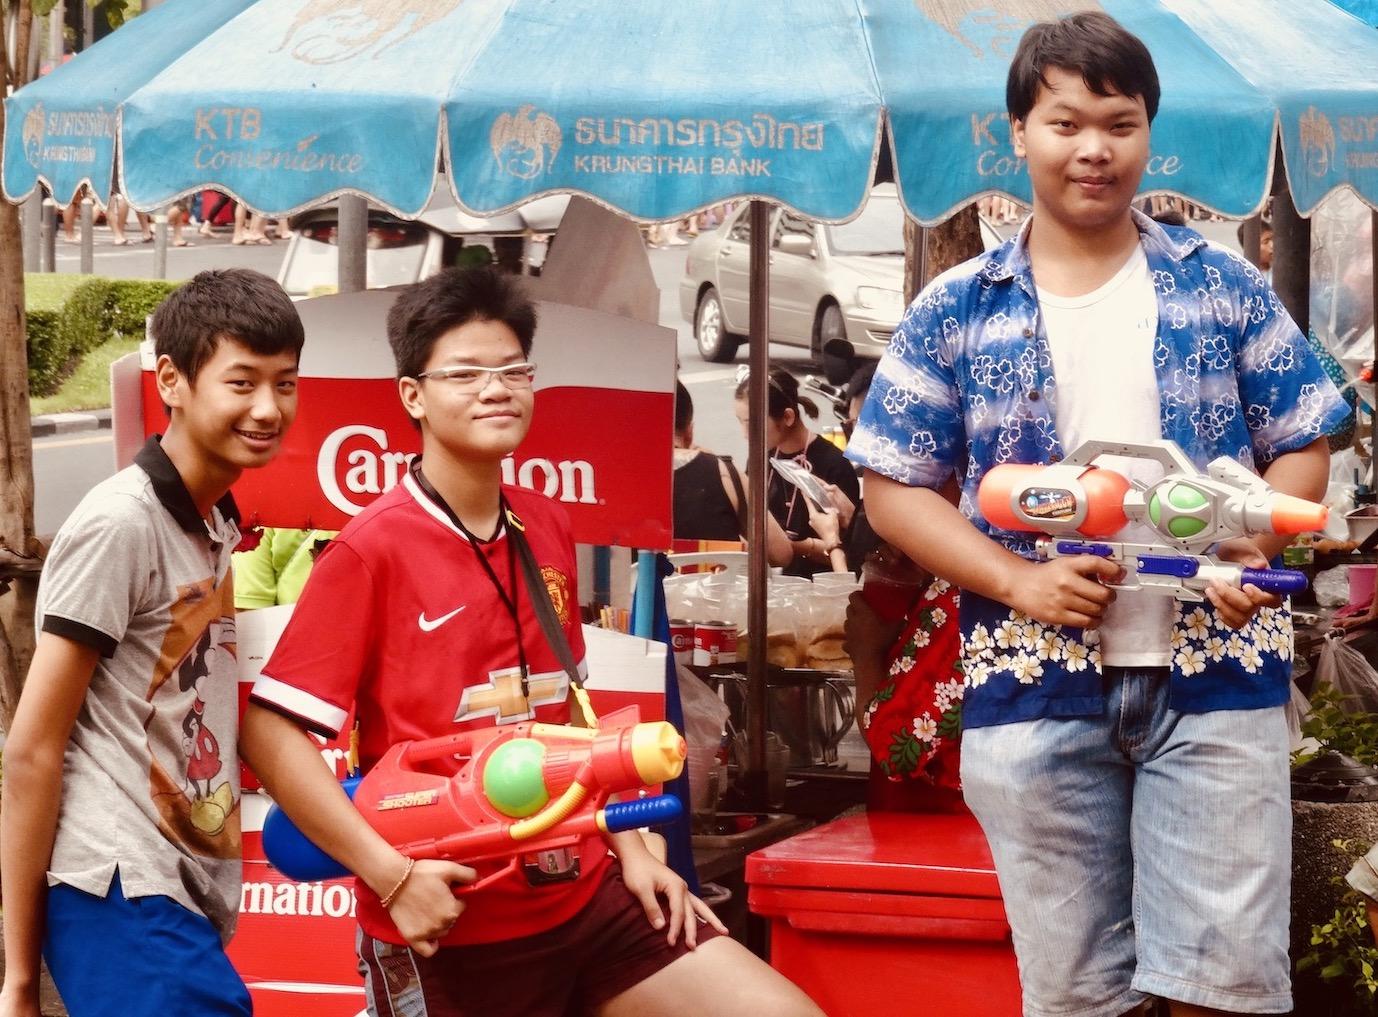 Songkran Water Festival Bangkok